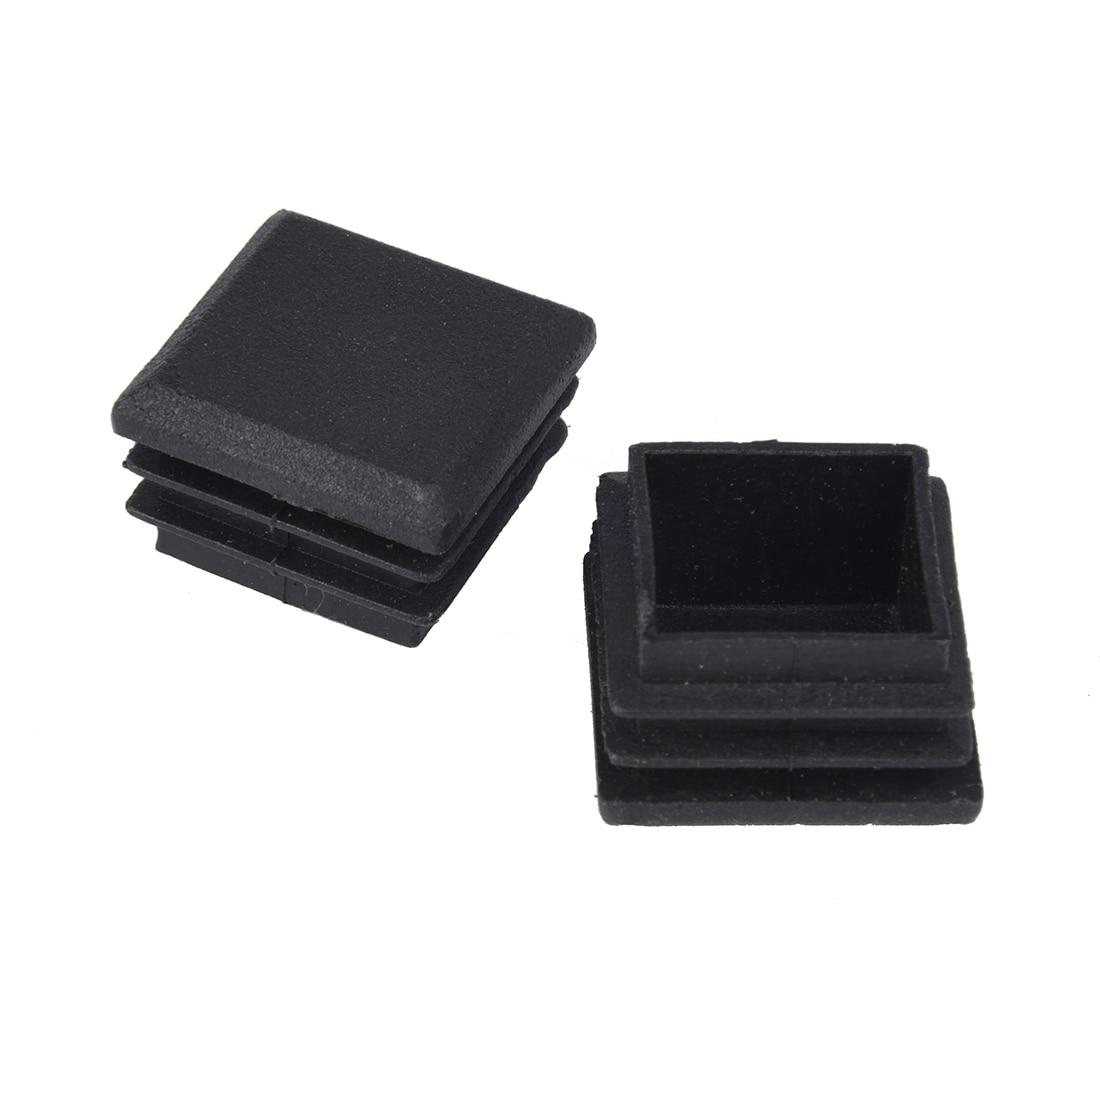 цена на 10 Pcs Black Plastic Square Tube Inserts End Blanking Cap 25mm x 25mm